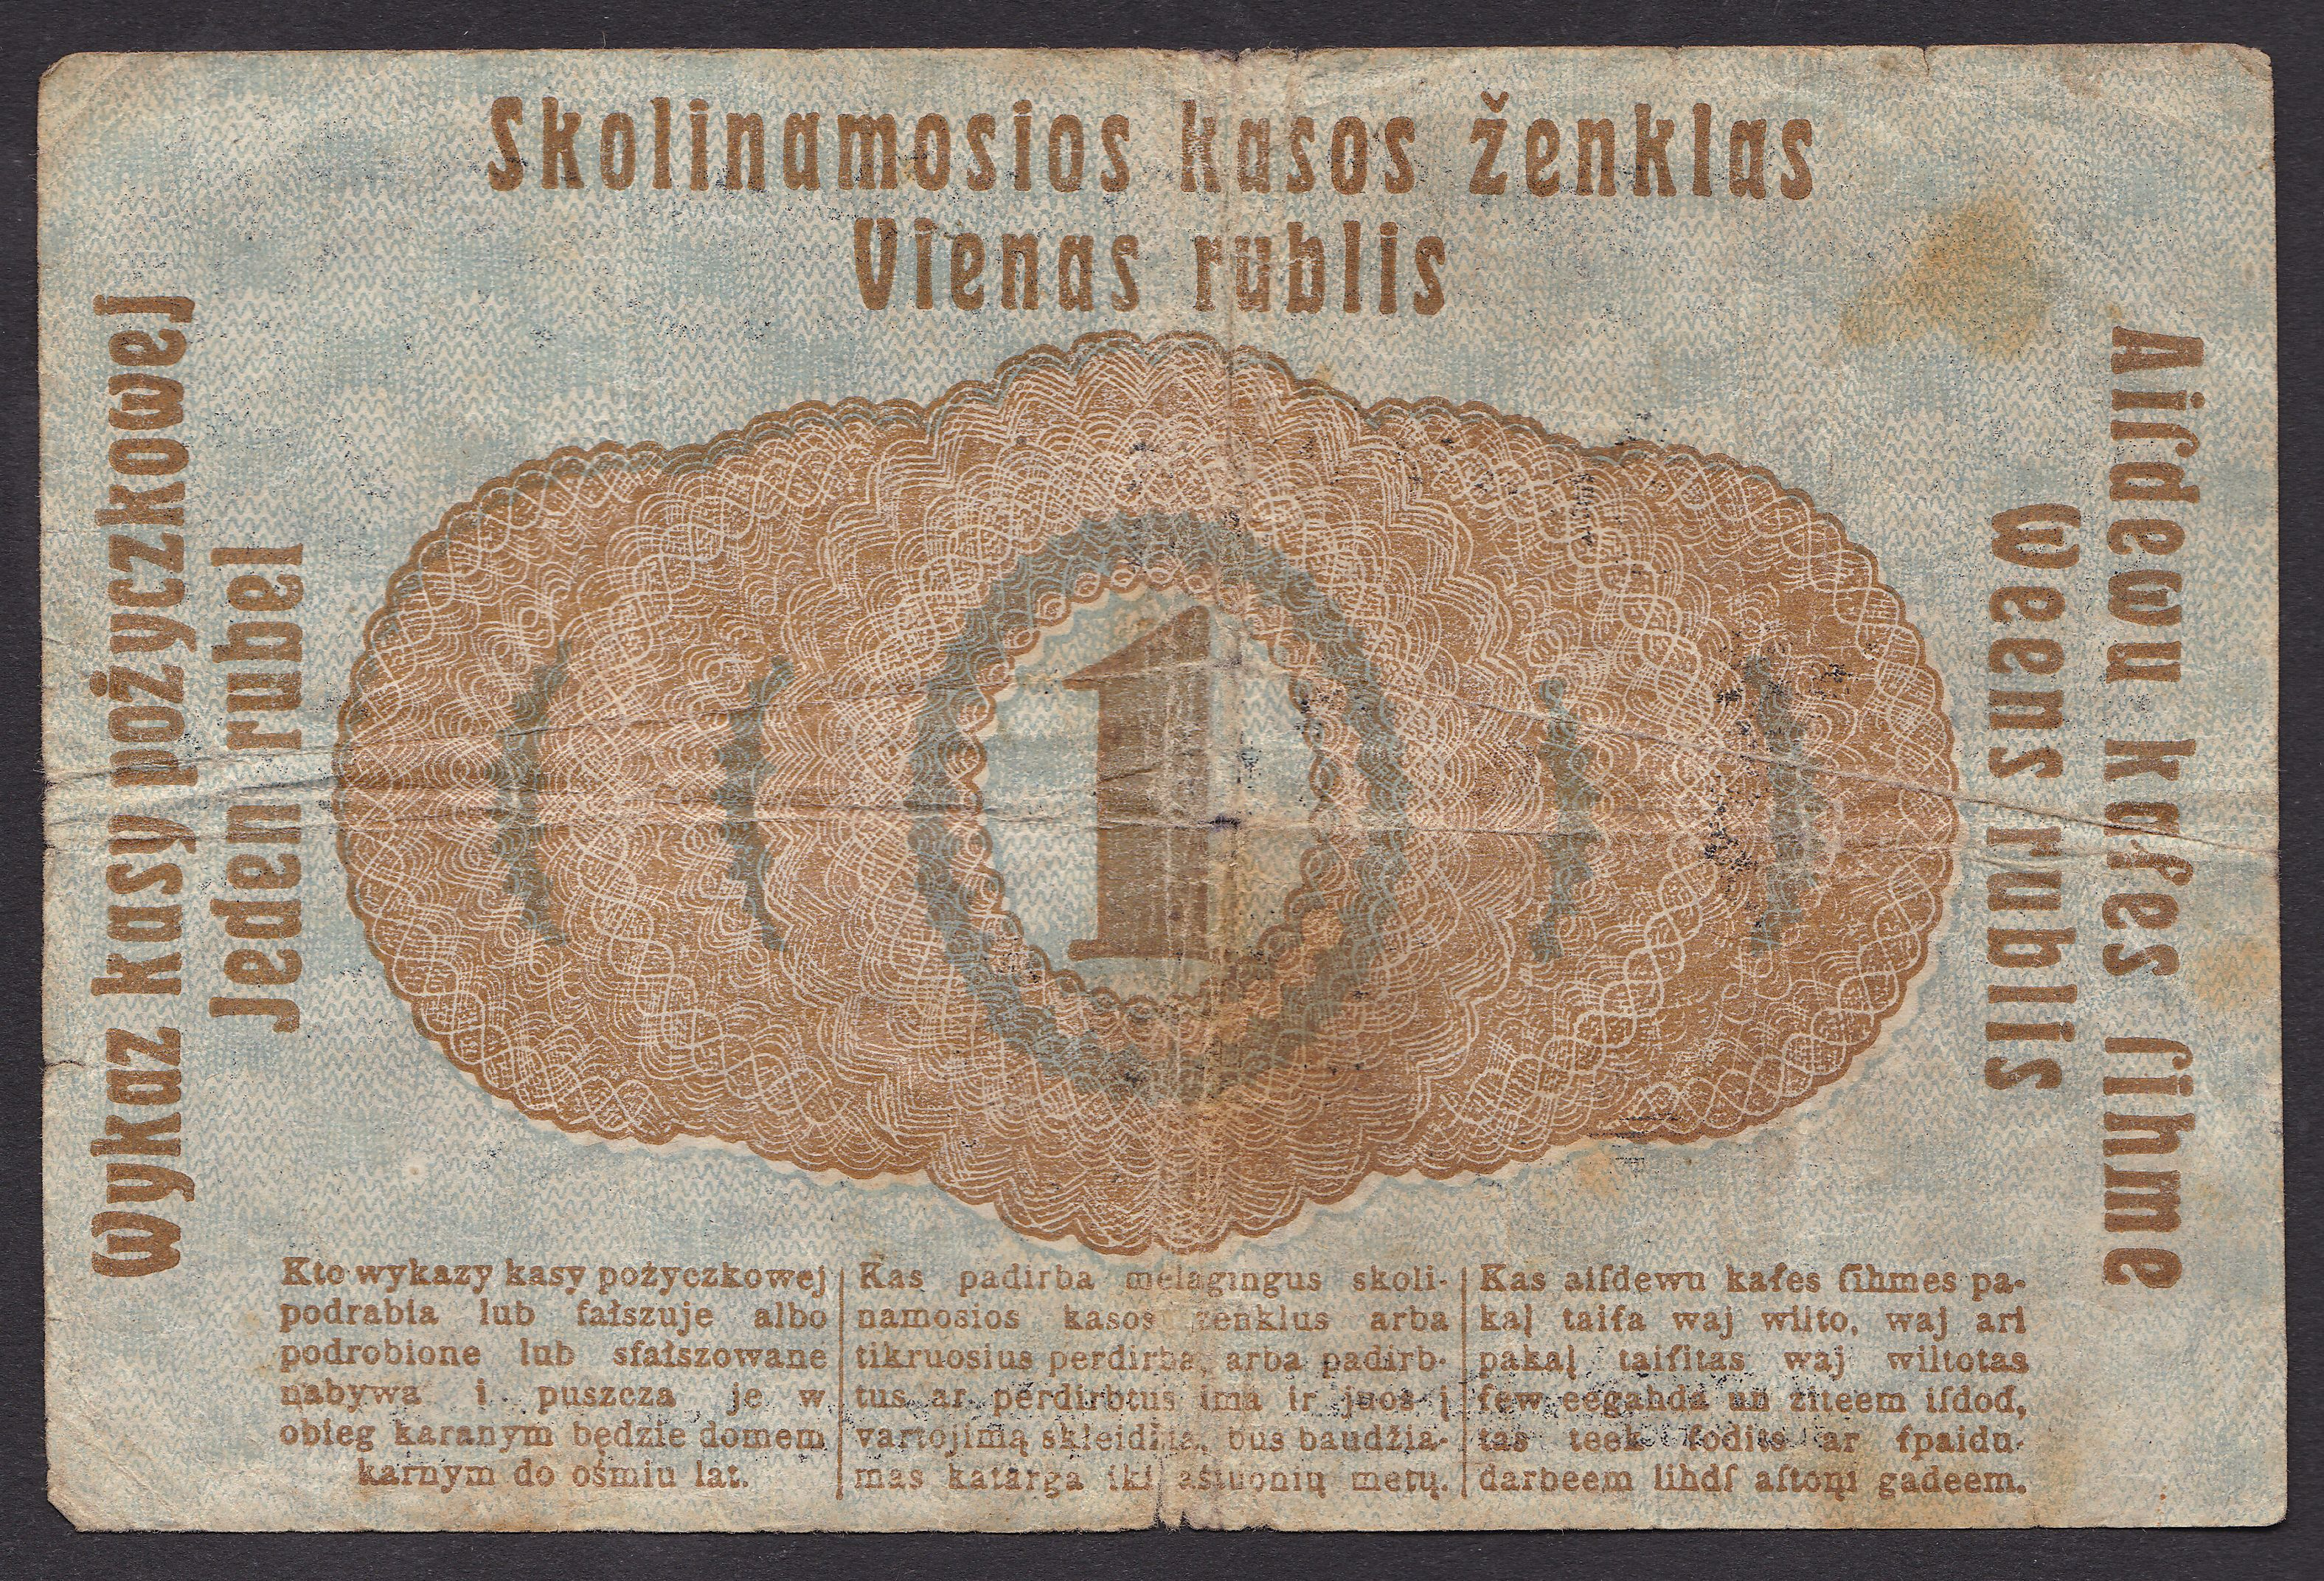 1916 German Armed Forces Ein Rubel Emergency Money Bank Note